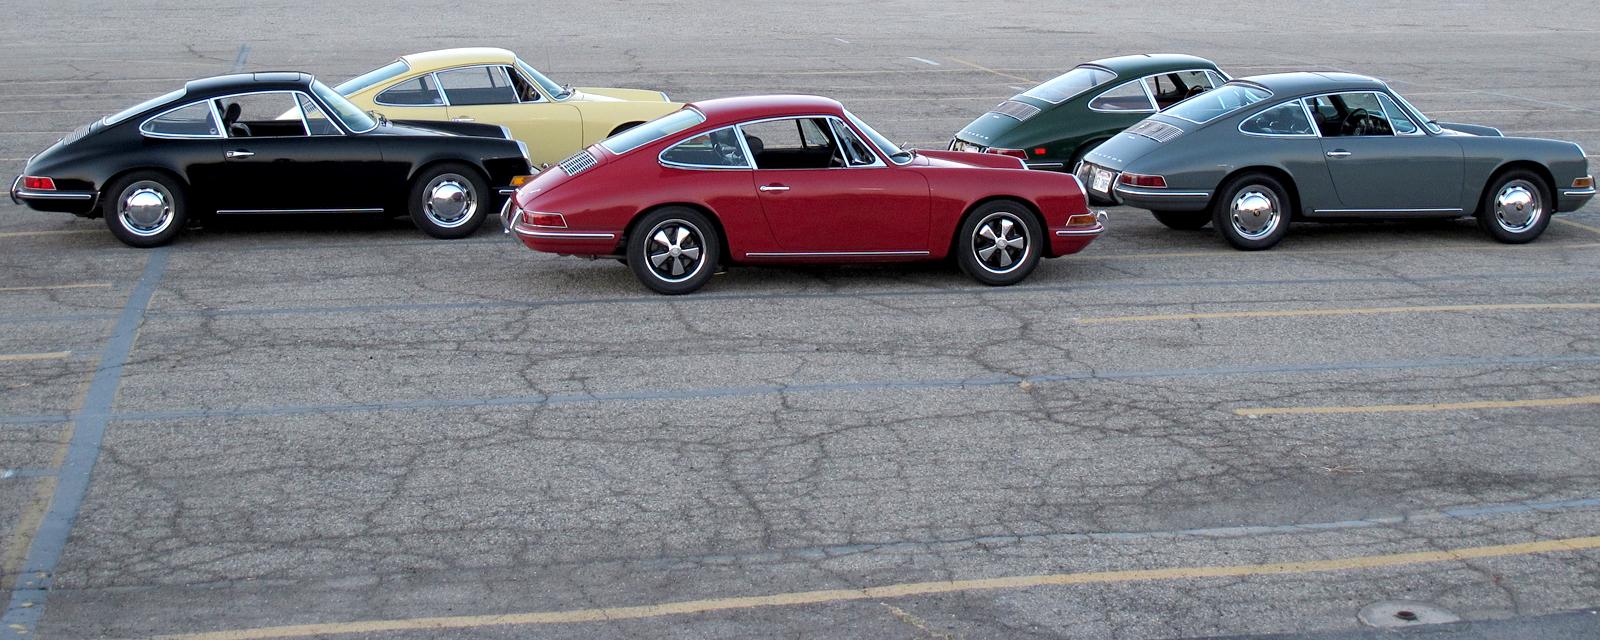 912 Colors - 912 Registry